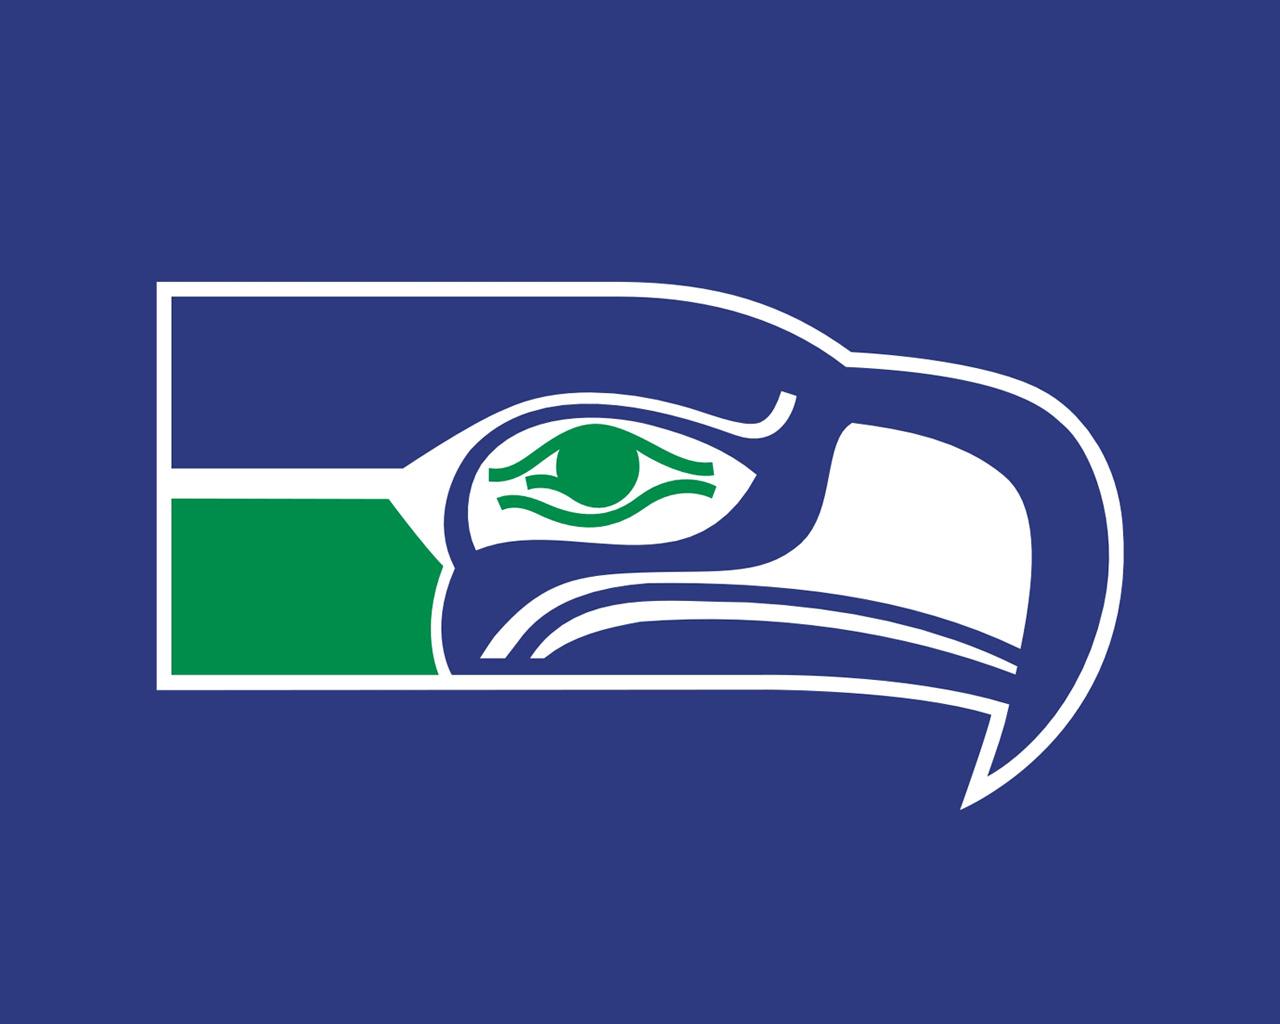 The original seahawks logo auto tone the news biocorpaavc Image collections